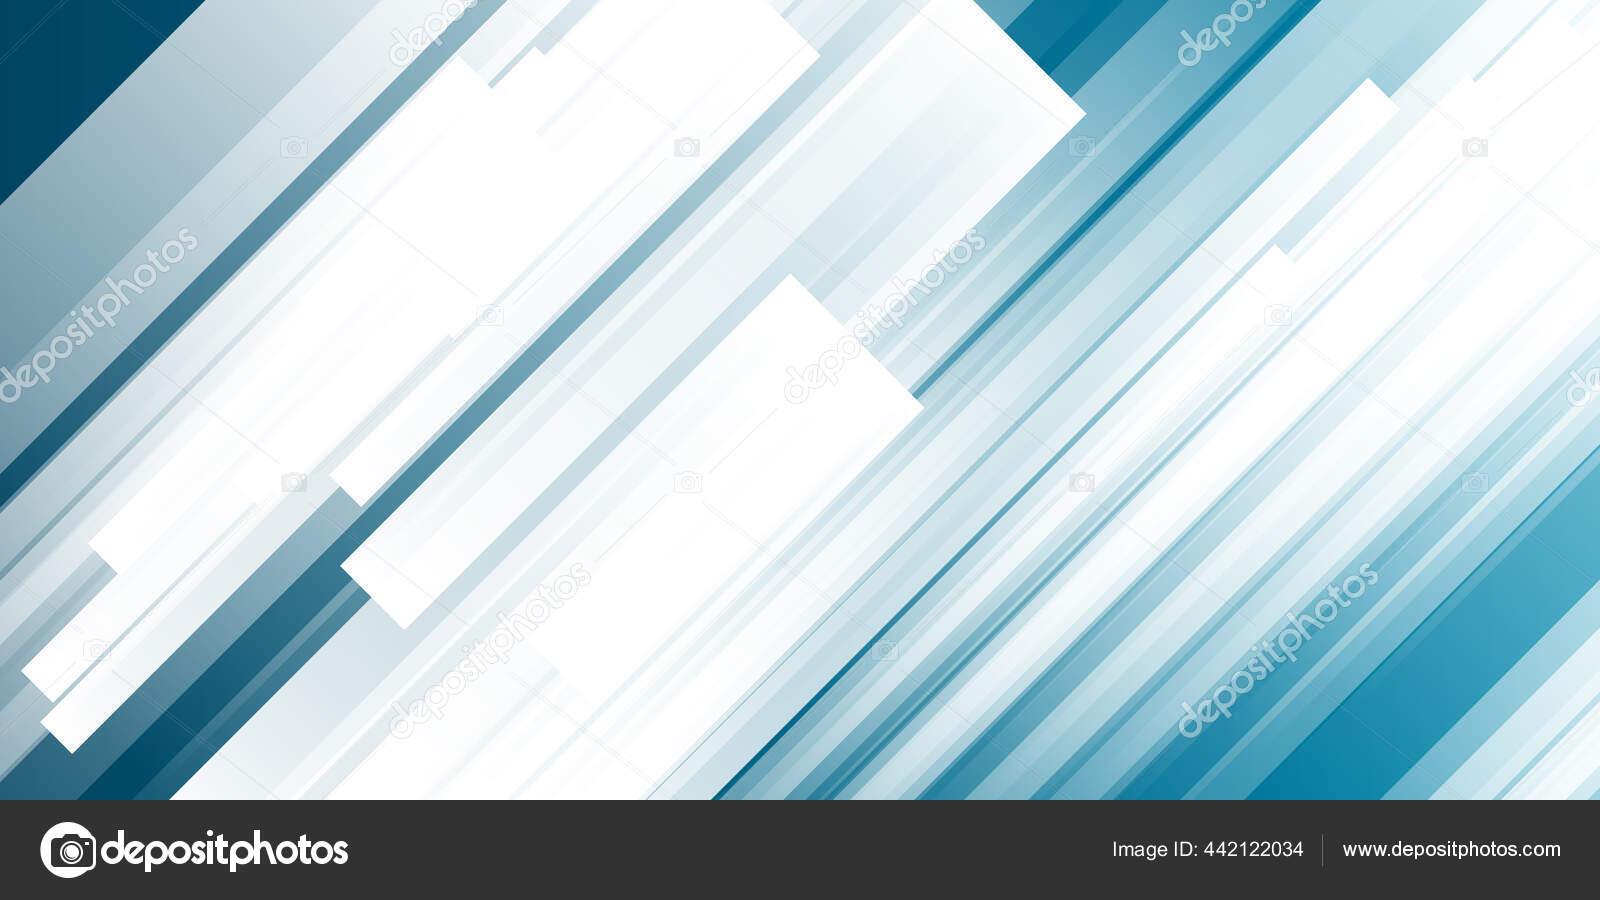 Biru Dan Putih Latar Belakang Dengan Elemen Garis Mengkilap Vektor — Stok  Vektor © Salmanalfa #442122034